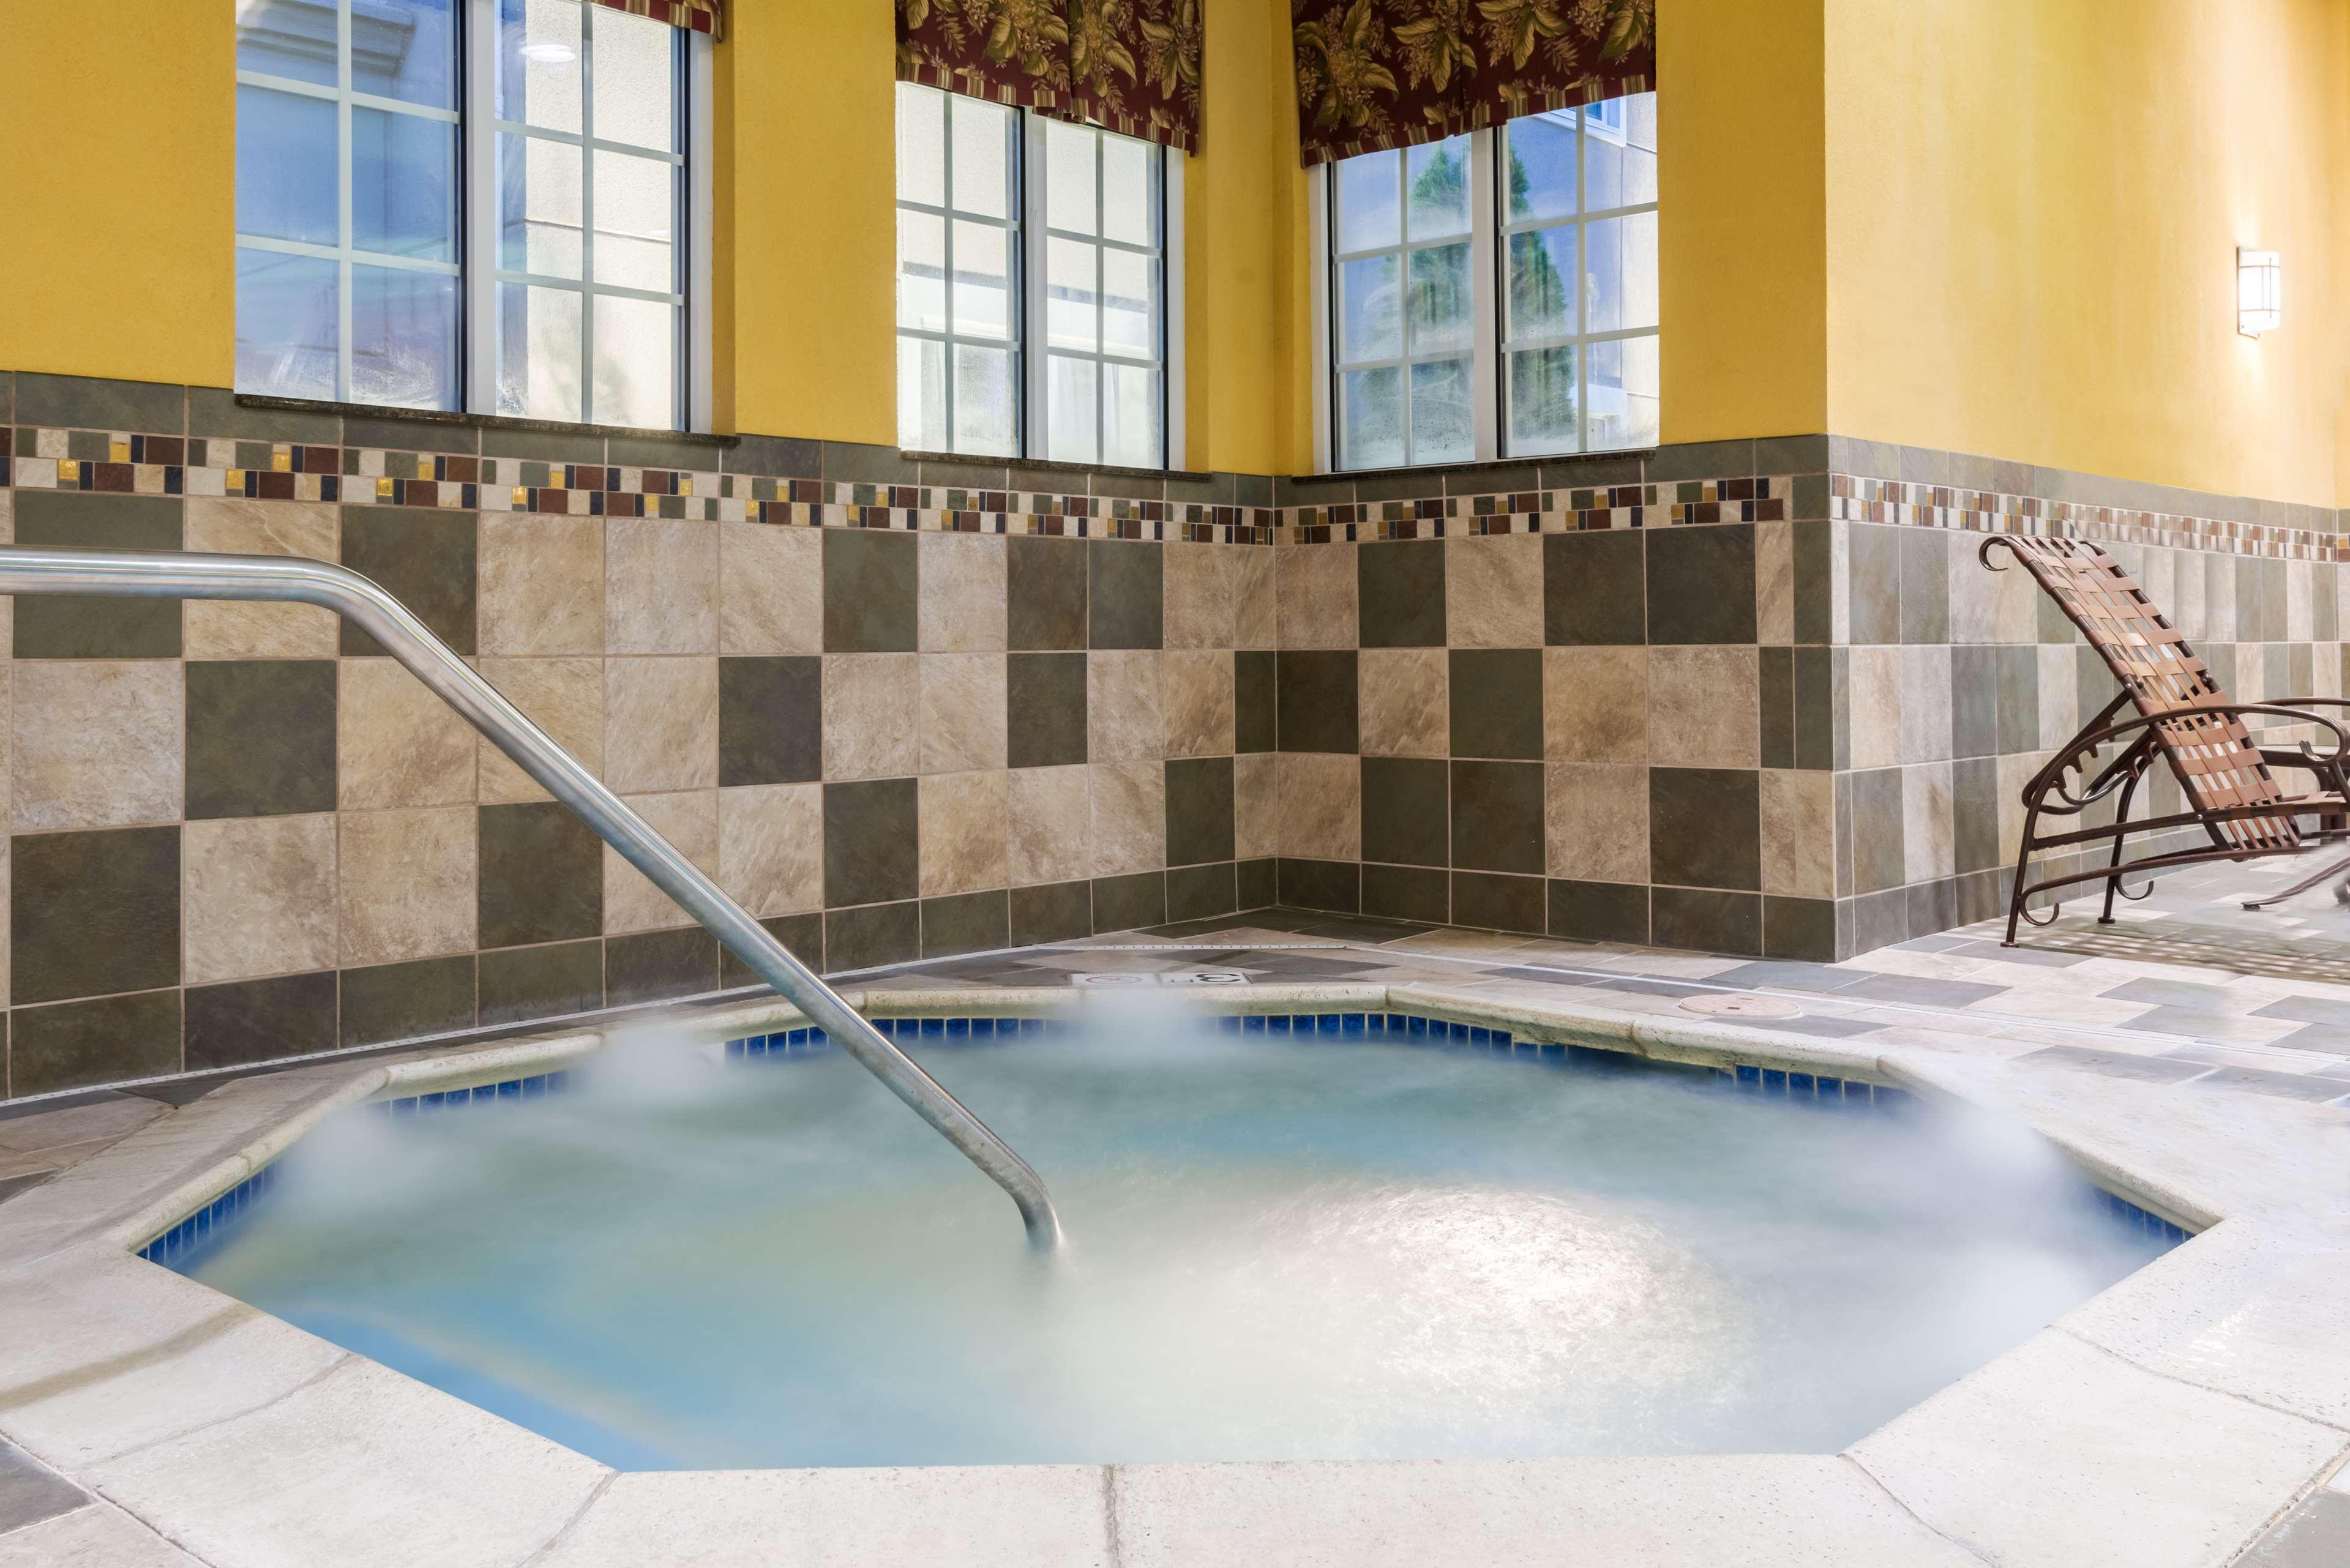 Homewood Suites by Hilton Holyoke-Springfield/North image 0